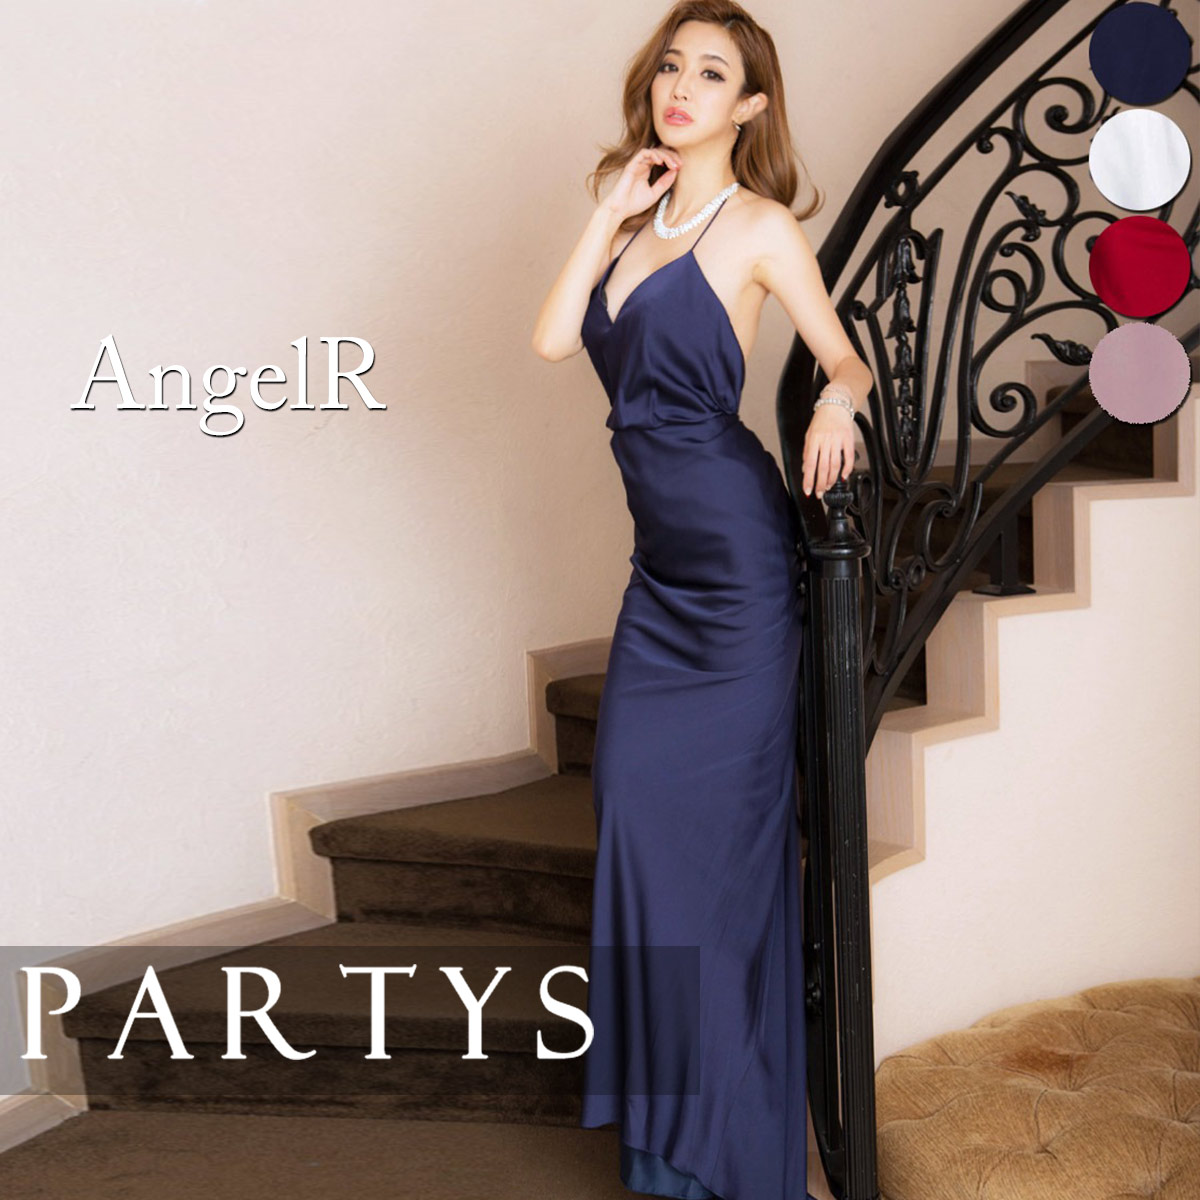 4b1a1291f5602   送料無料       Angel R   シンプル ホルターネック カクテル ドレス ロングドレス キャバドレス